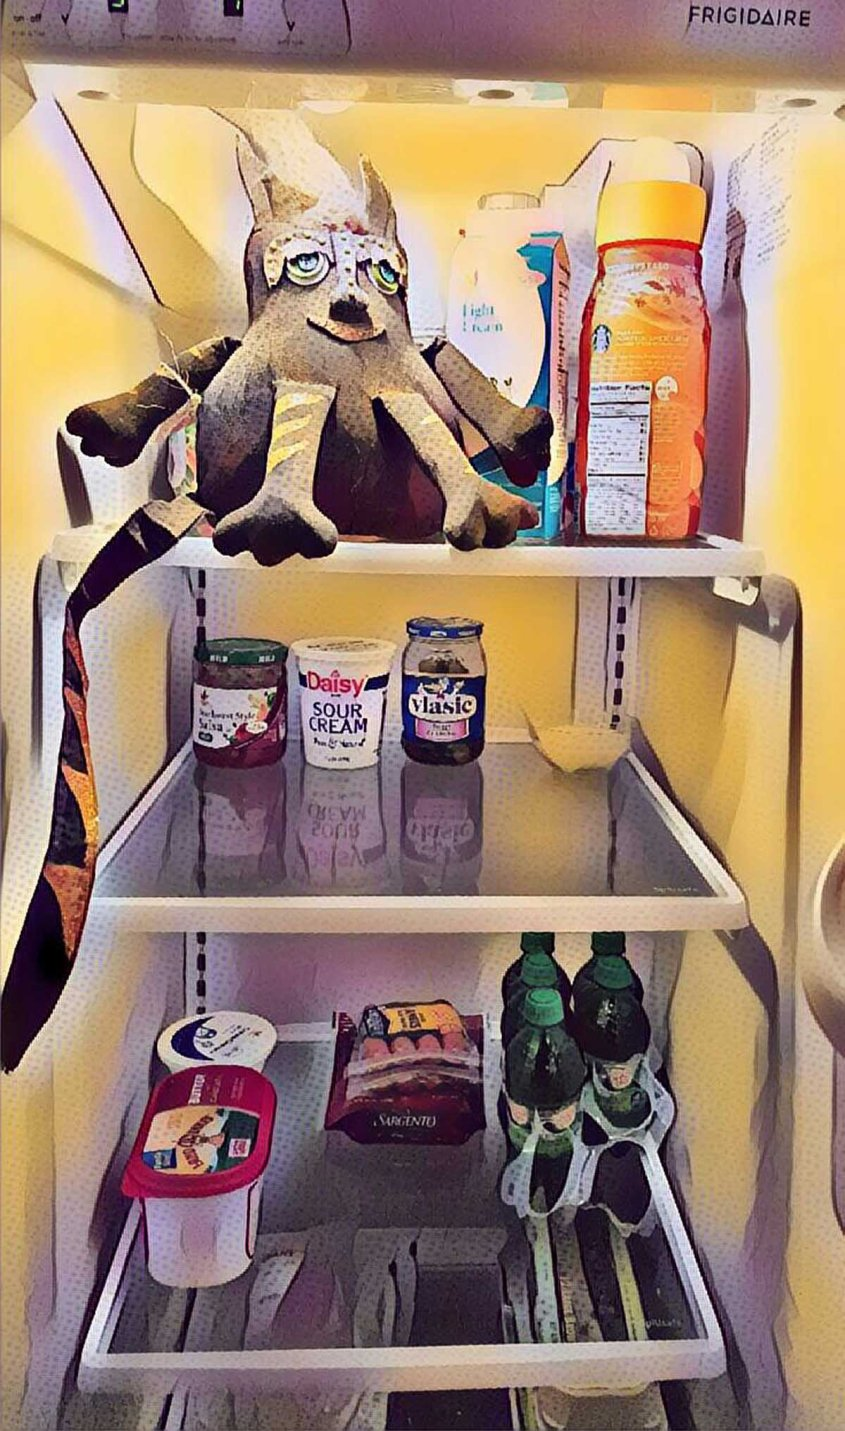 tacocatrefrigerator